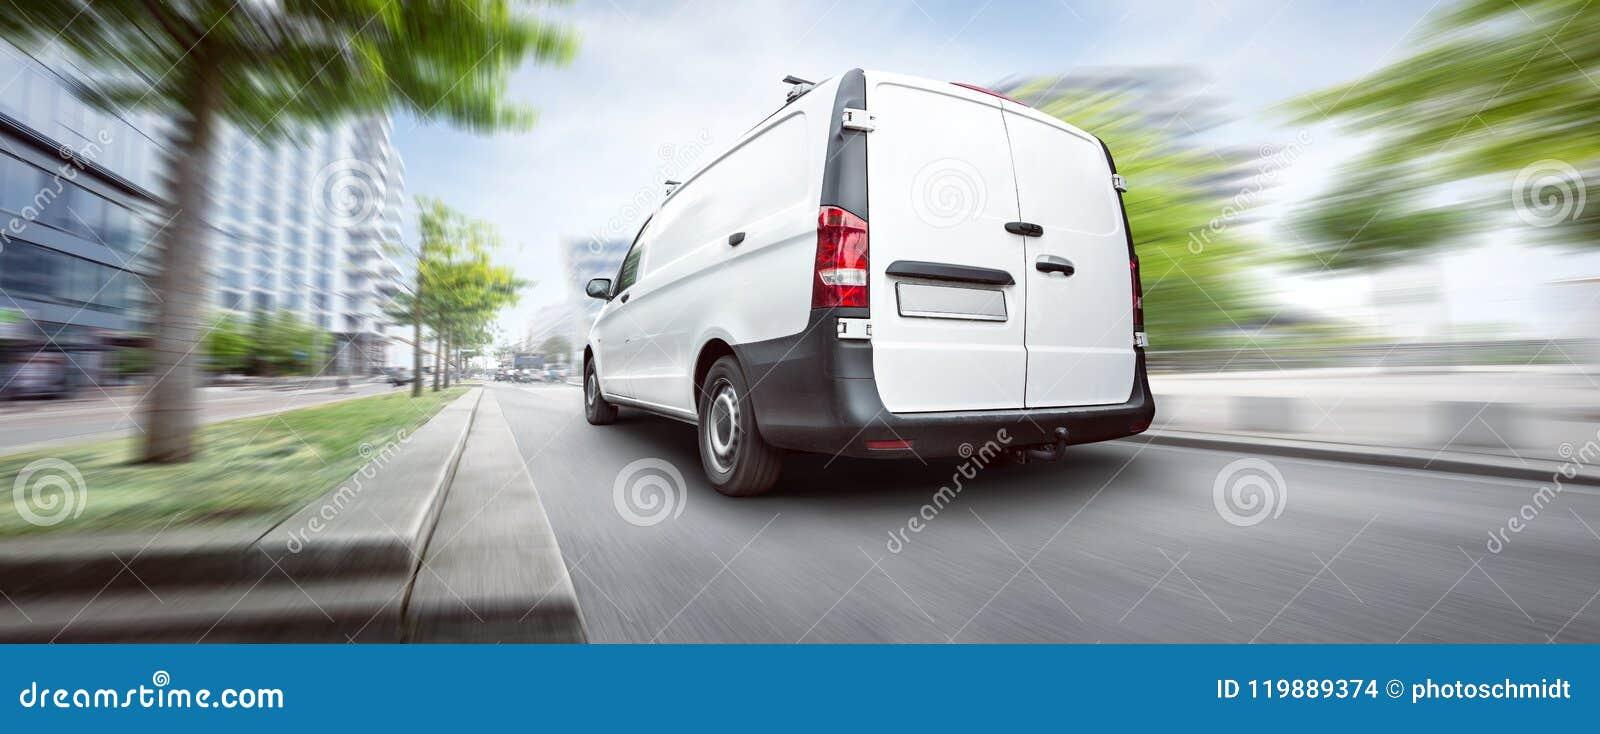 Commercial van driving in the city